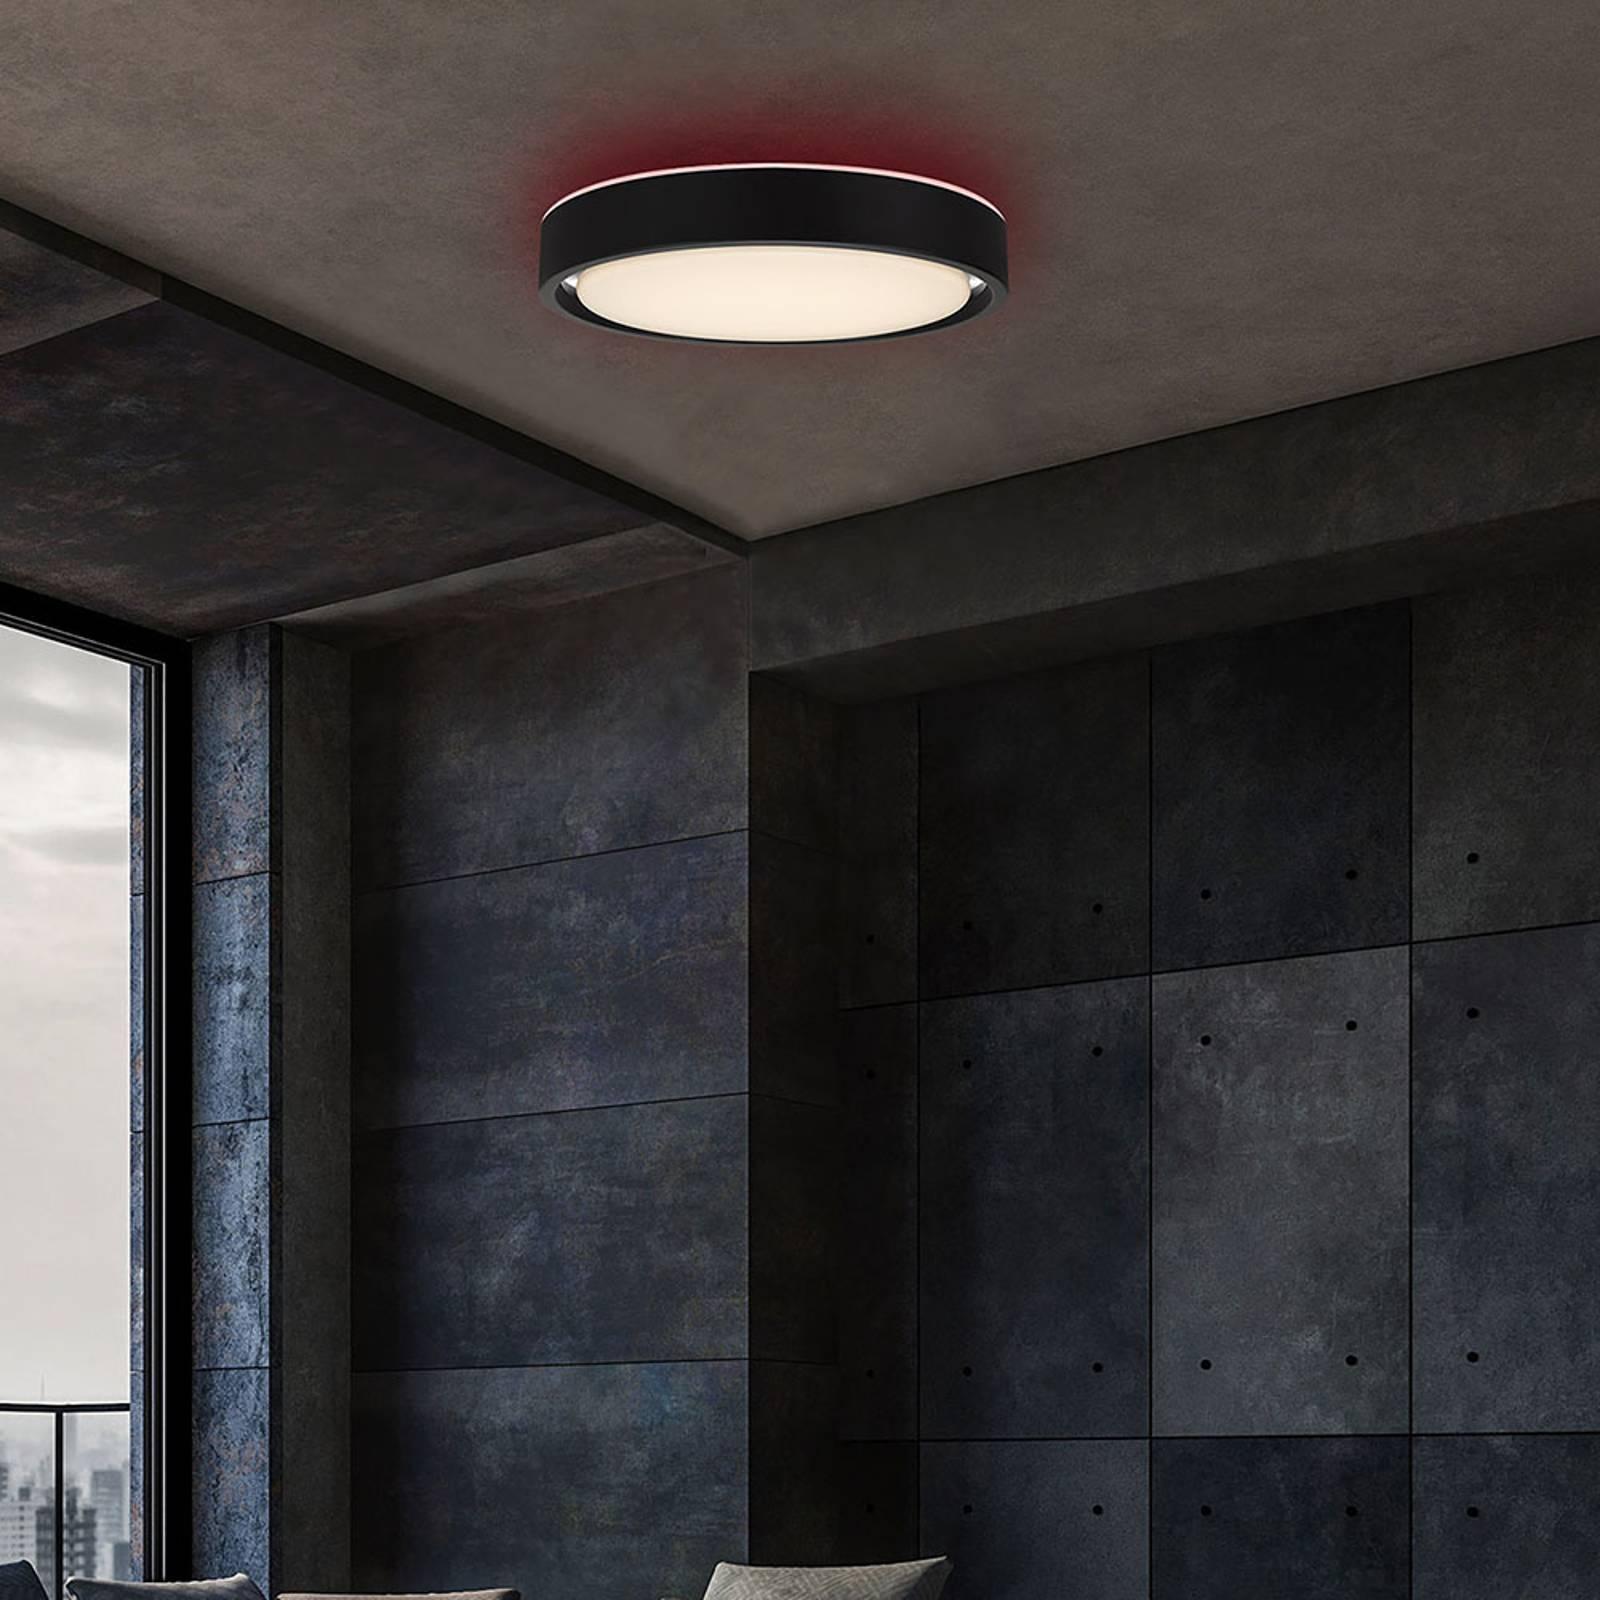 Lampa sufitowa LED Talena M RGB CCT czujnik czarna